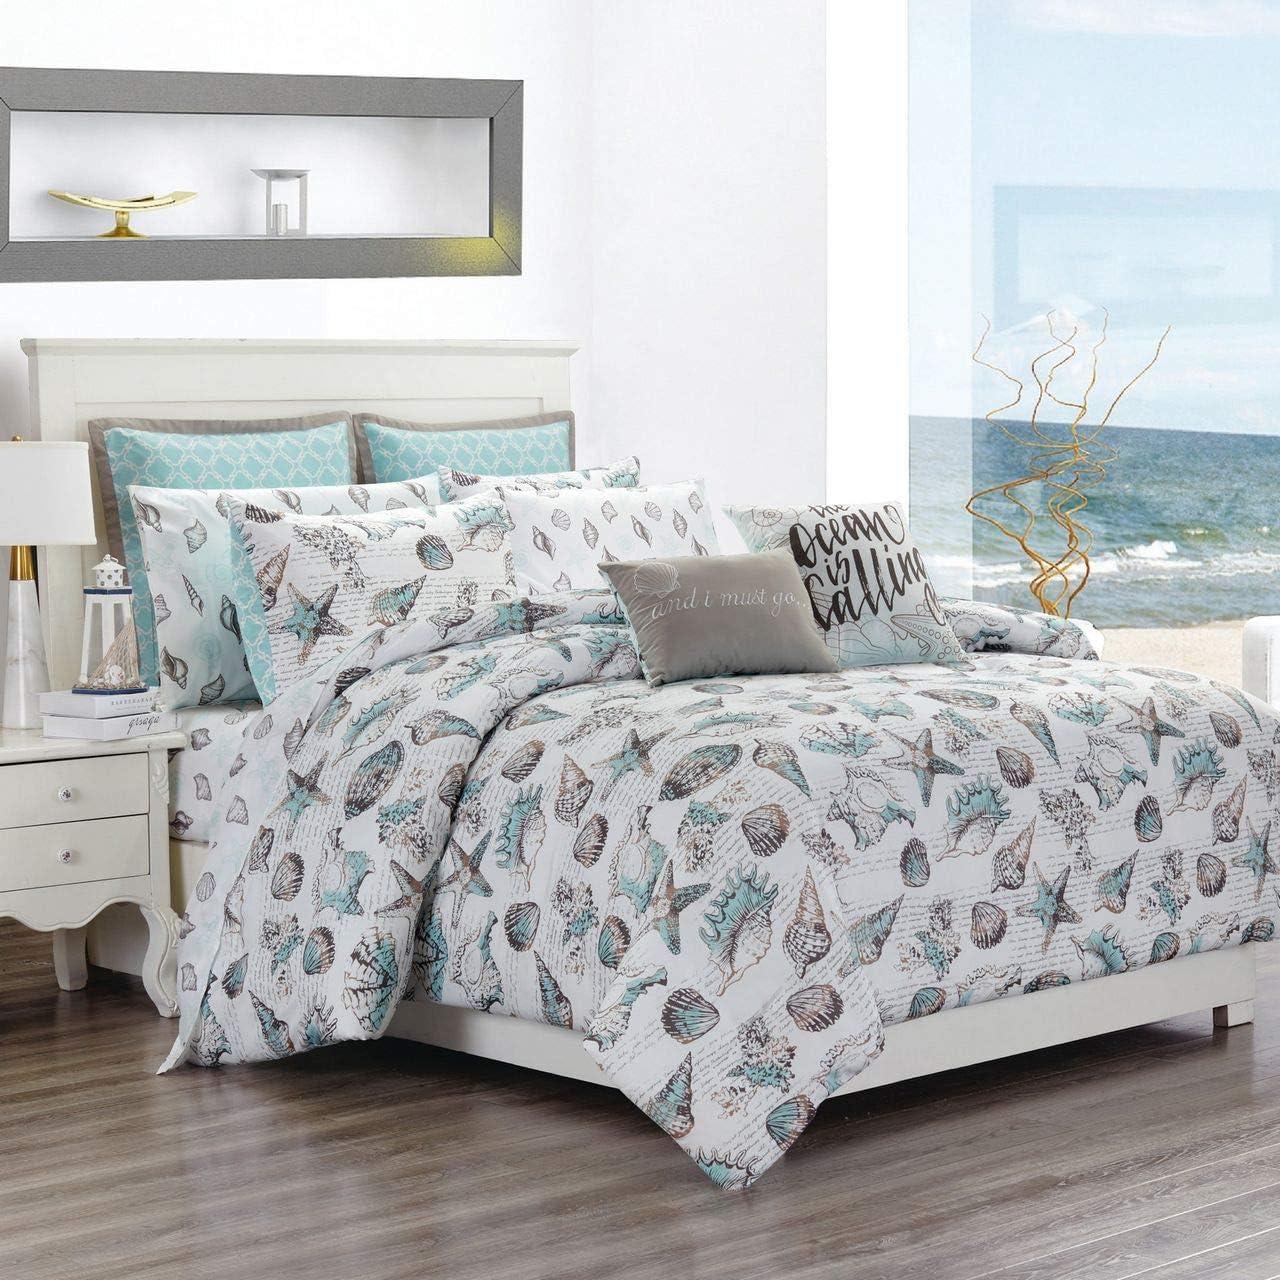 KingLinen 12 Piece Seashells Aqua/Gray Reversible Comforter Set with Sheets Queen